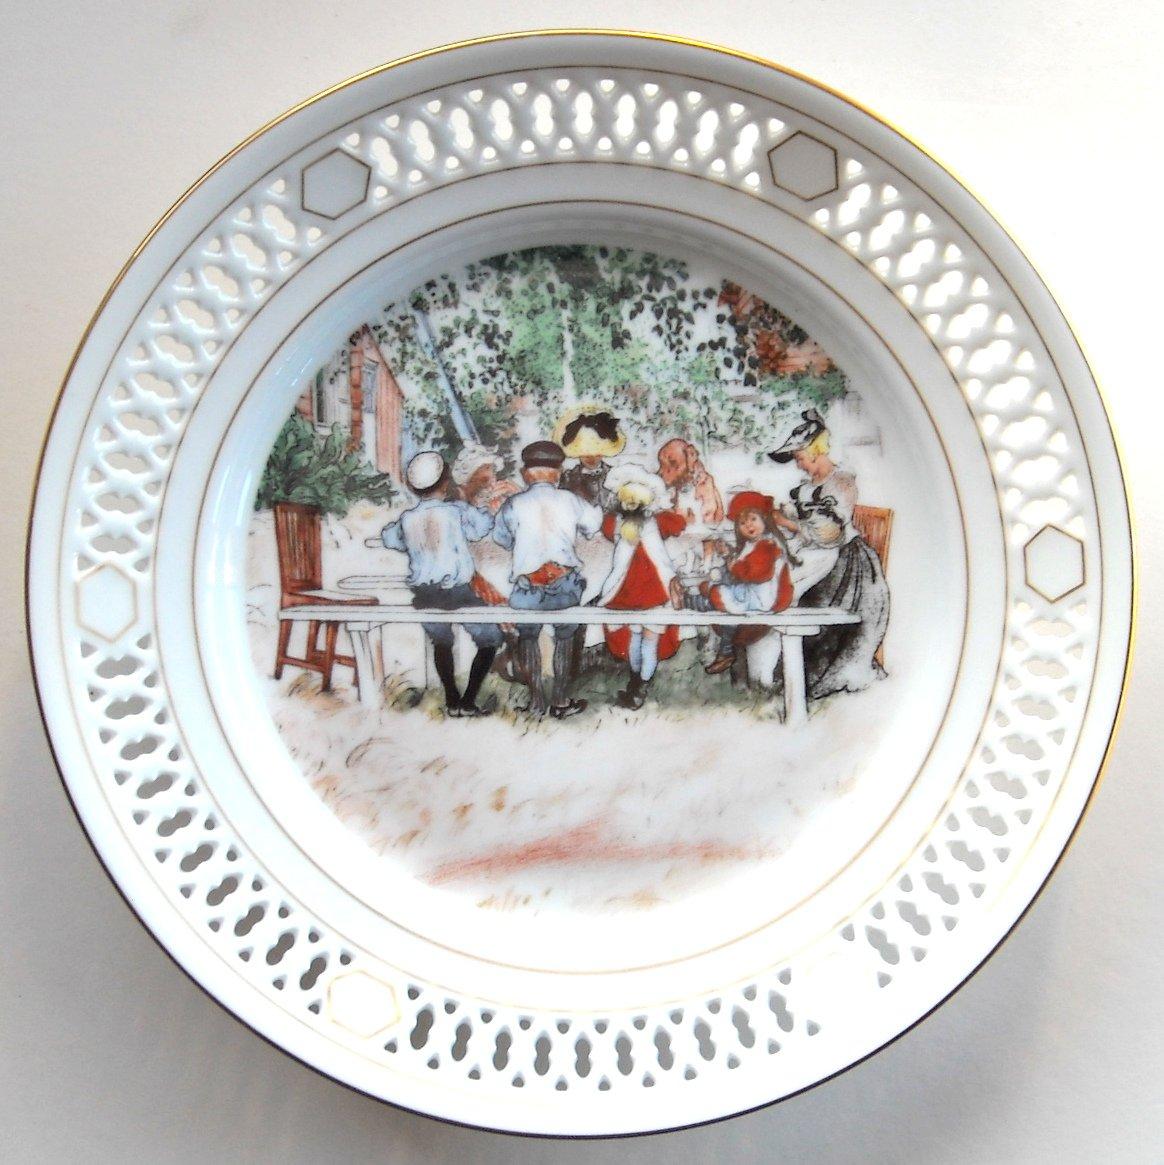 Danish Bing Grondahl Carl Larsson First North American Edition plate 2 1978